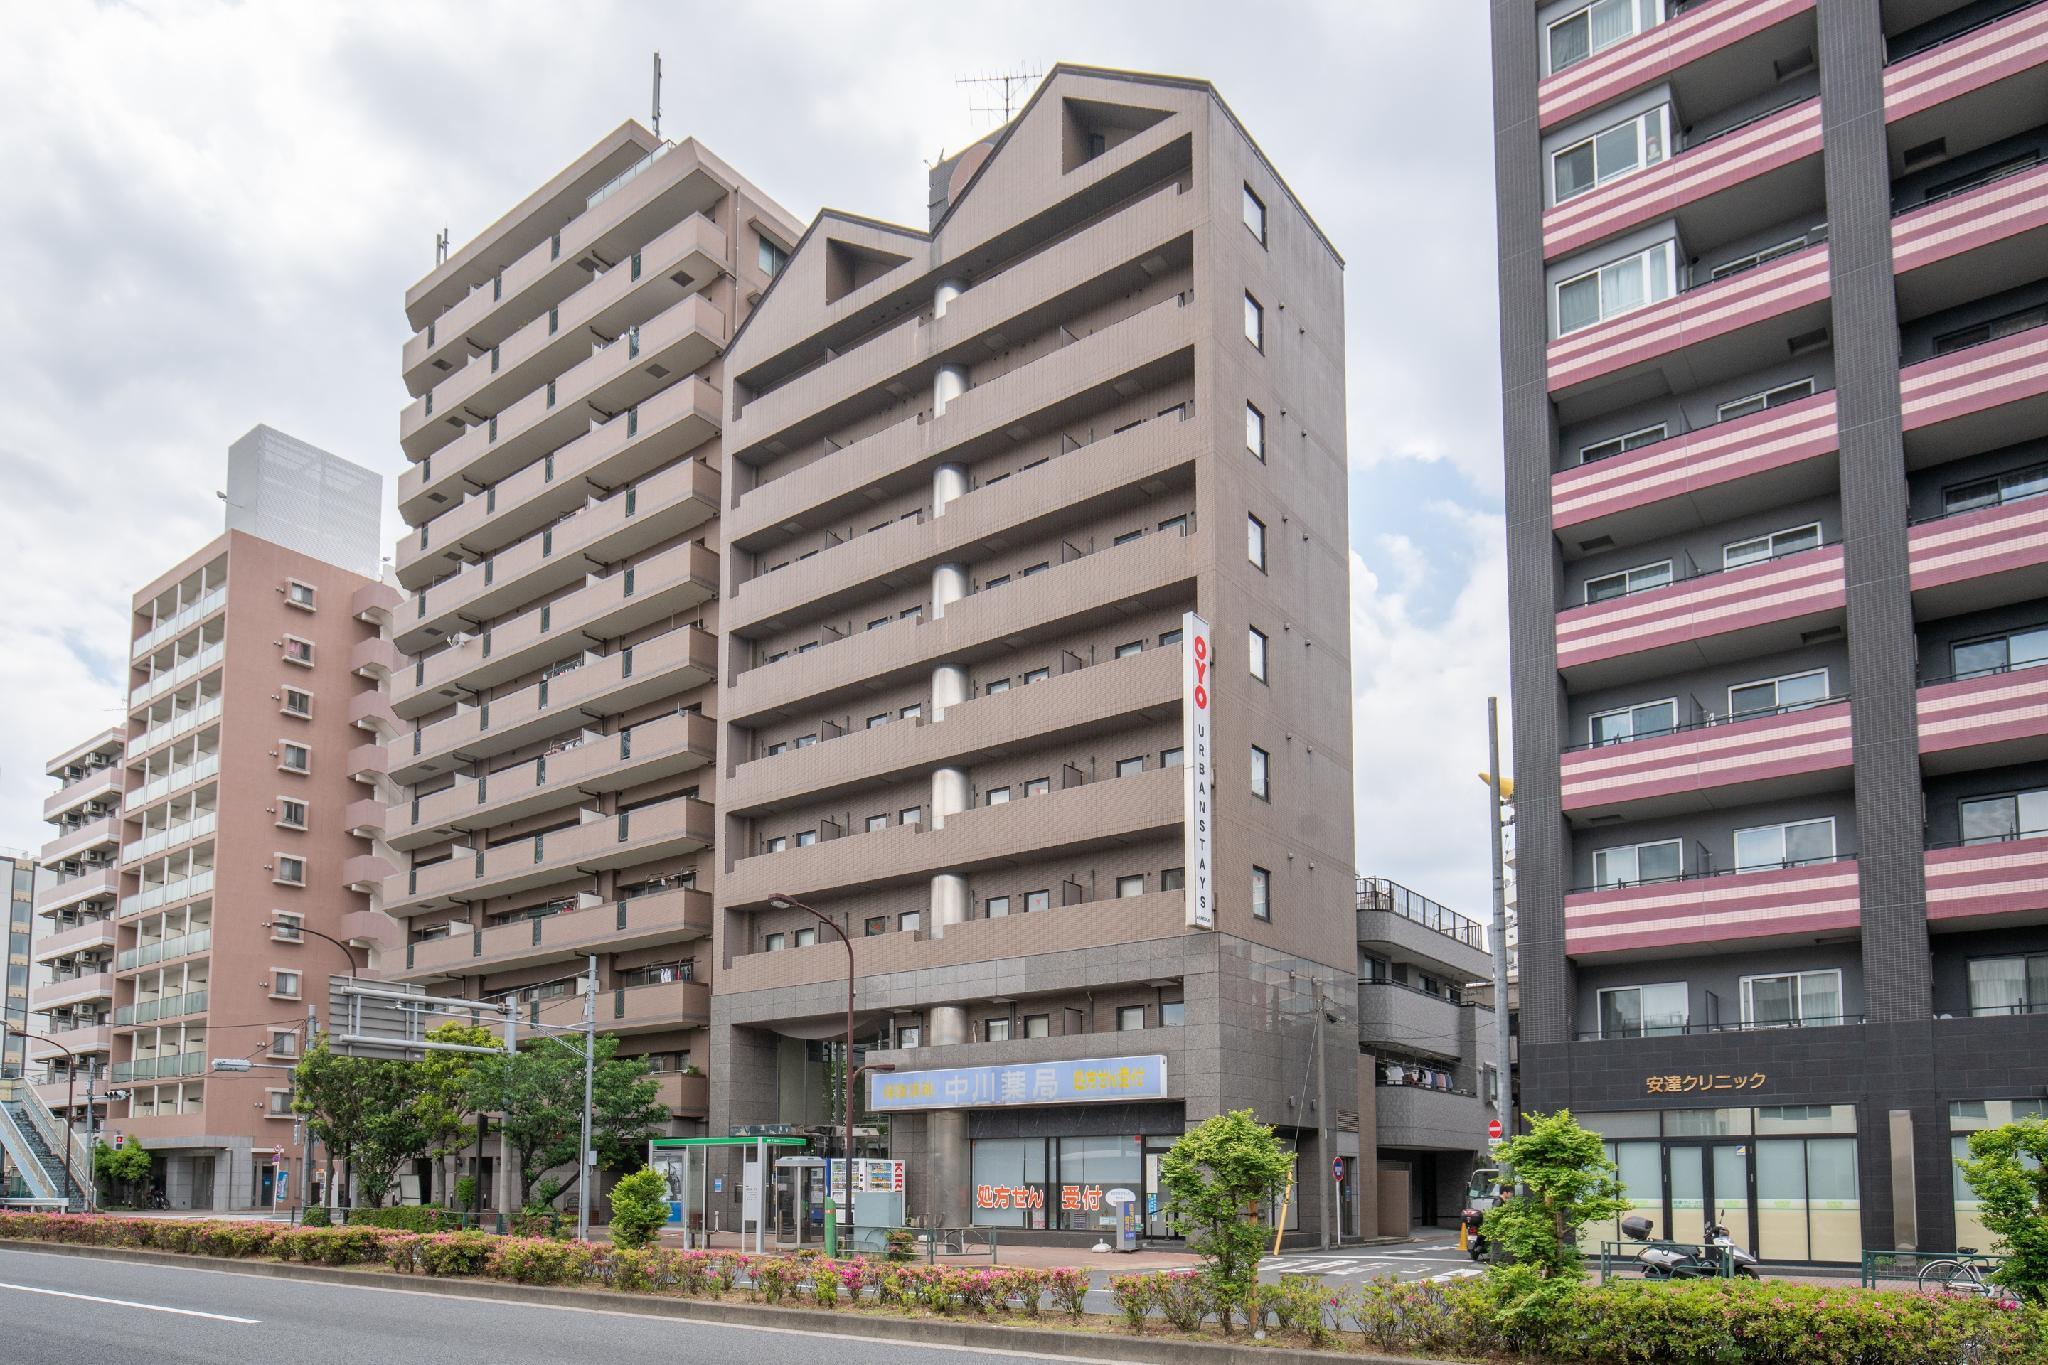 OYO 440 Urban Stays Asakusa